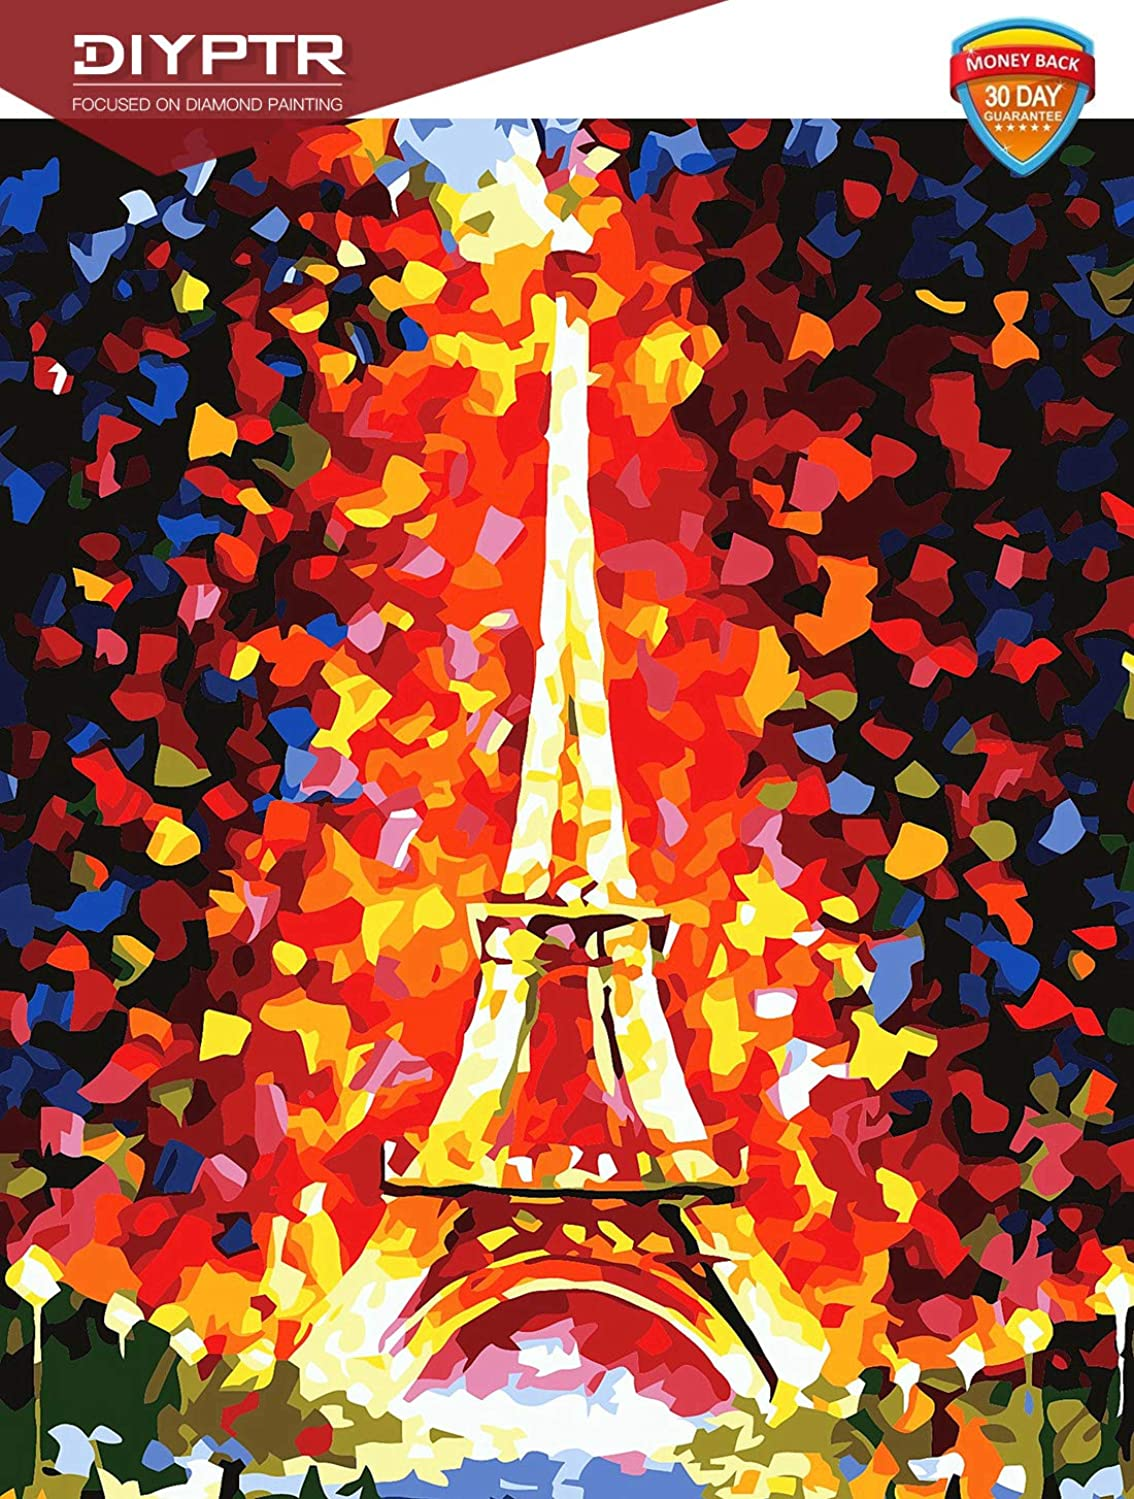 DIY 5D Diamond Painting Kit, Full Drill Rhinestone Embroidery Arts Craft Canvas Wall Decor, Easy to Paint, Paris Eiffel Tower 11.8 x 15.8 inch